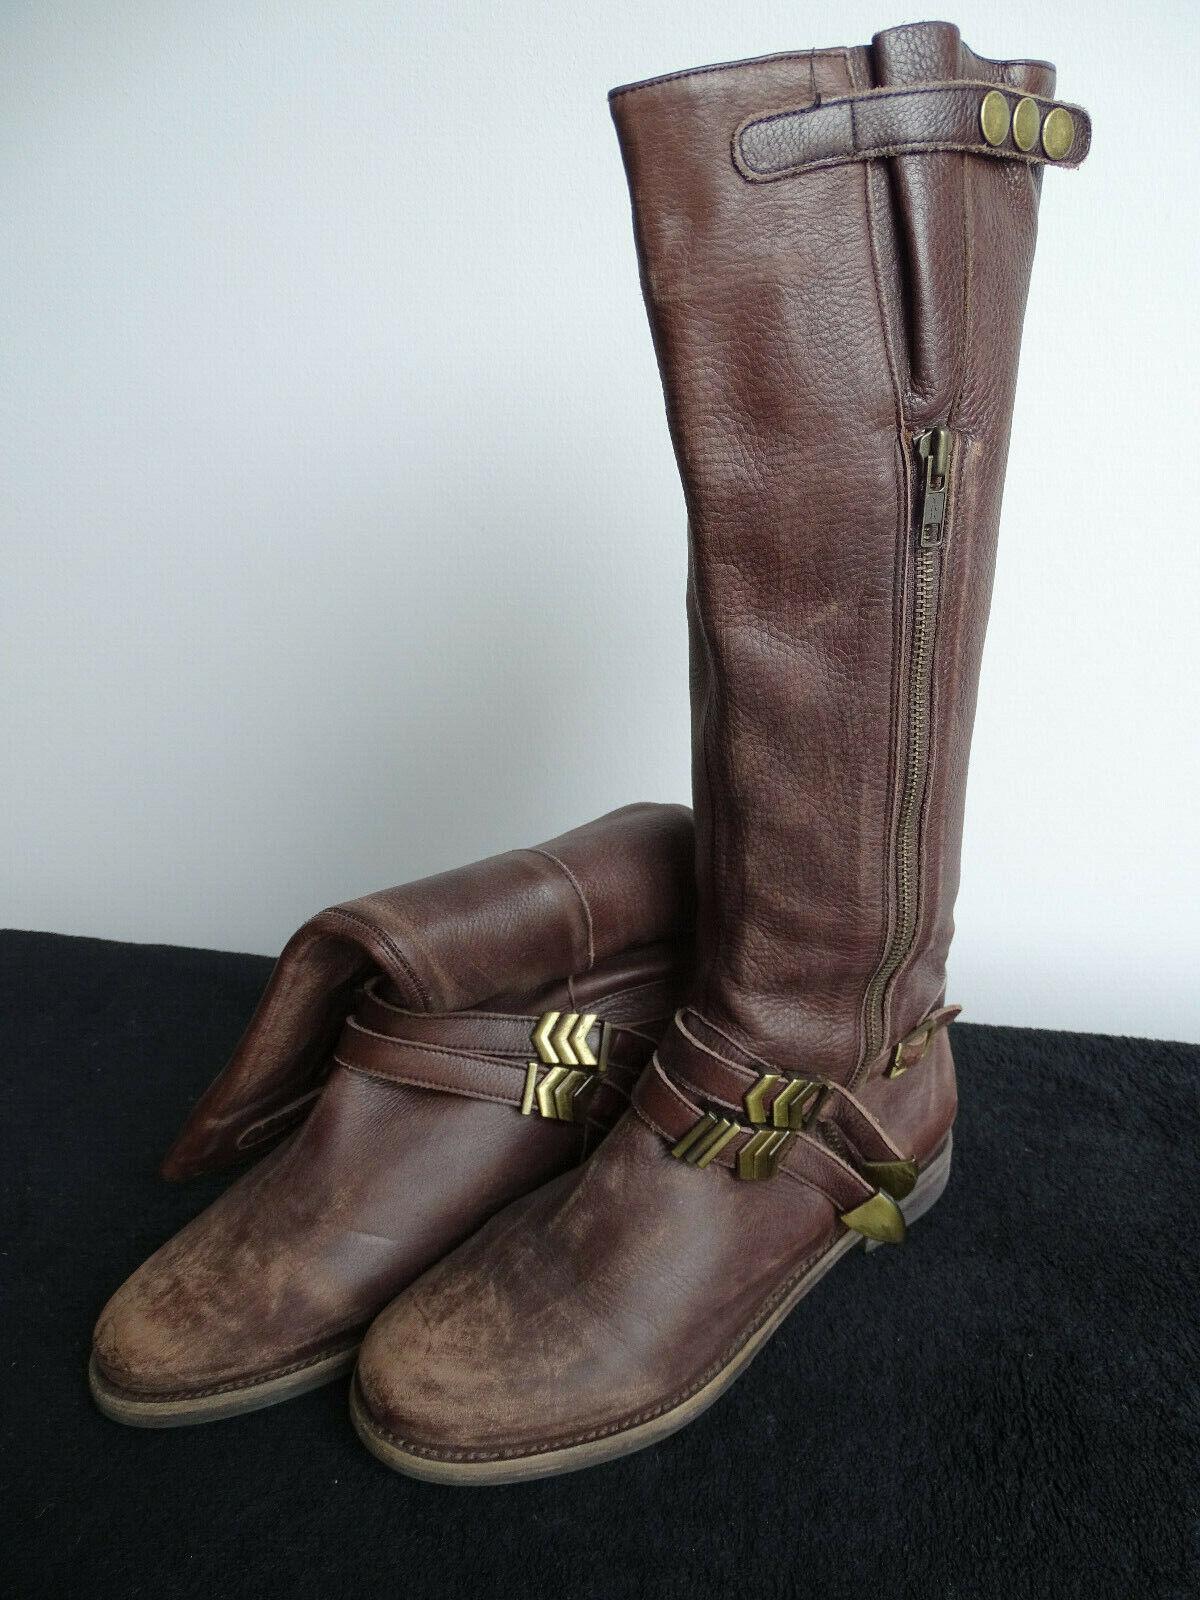 Keilabsatz Boots Braun Buffalo 39 wie neu Stiefeletten